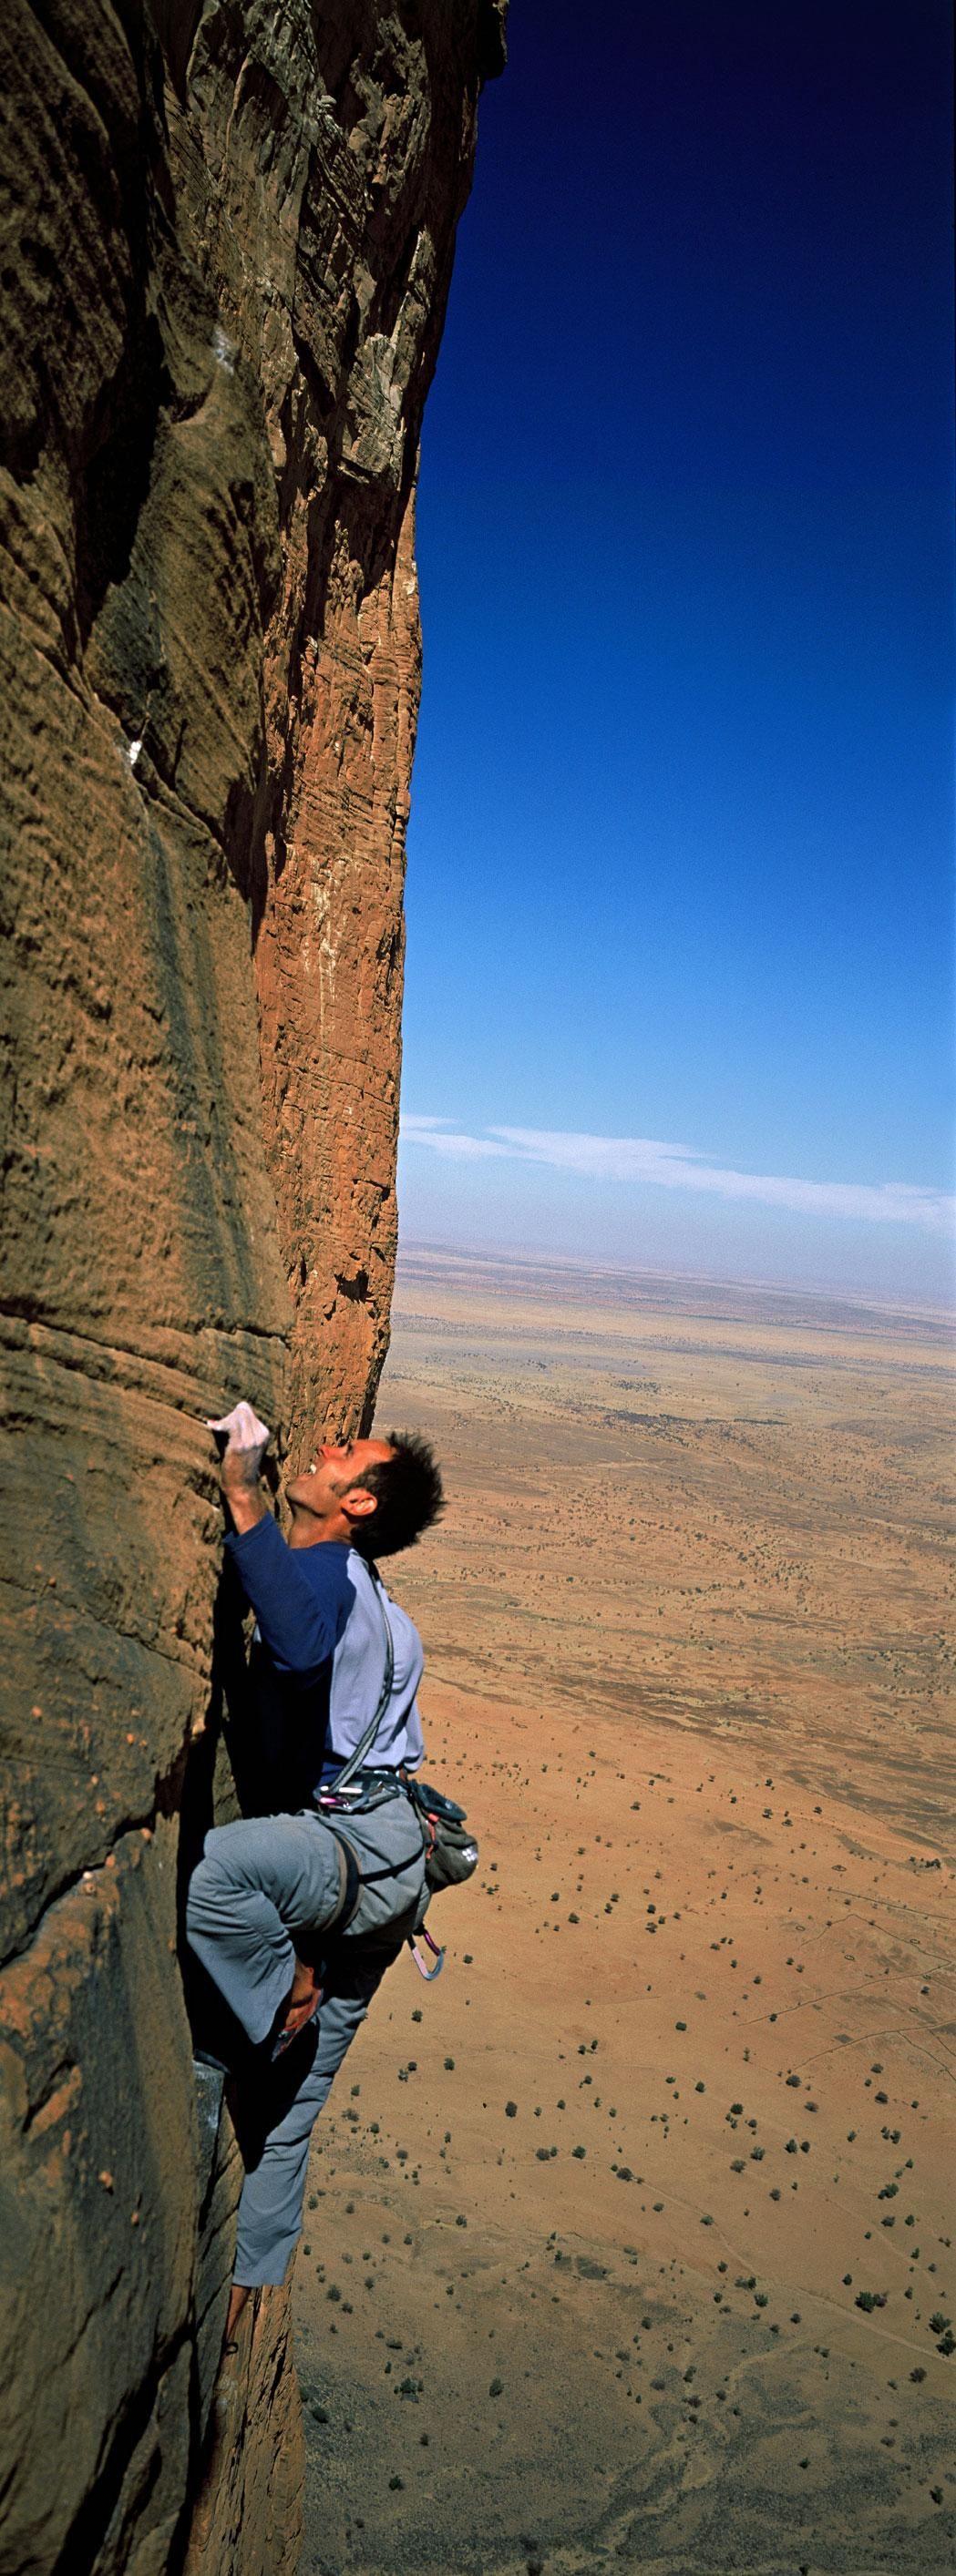 Going Vertical Ice Climbing Rock Climbing Climbing